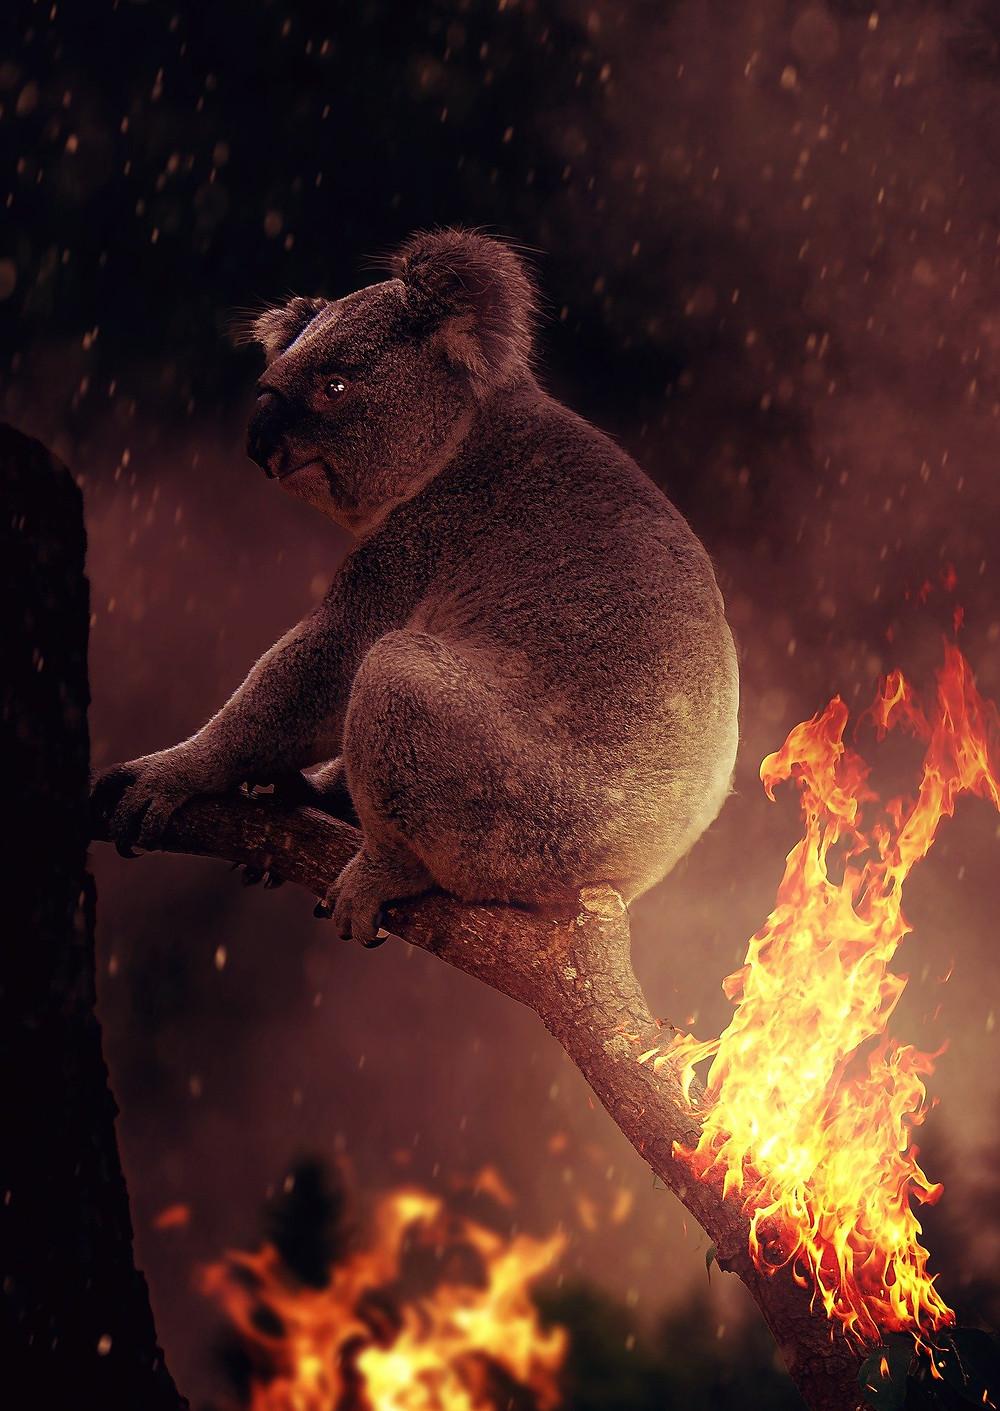 bushfire smoke, koalas and bushfire, australian wildlife and bushfires, wild life casualties from australian bushfire,detox from bushfire smoke, coping with bushfire smoke, canberra doula, canberra air quality, worst air quality in the world, australia burns